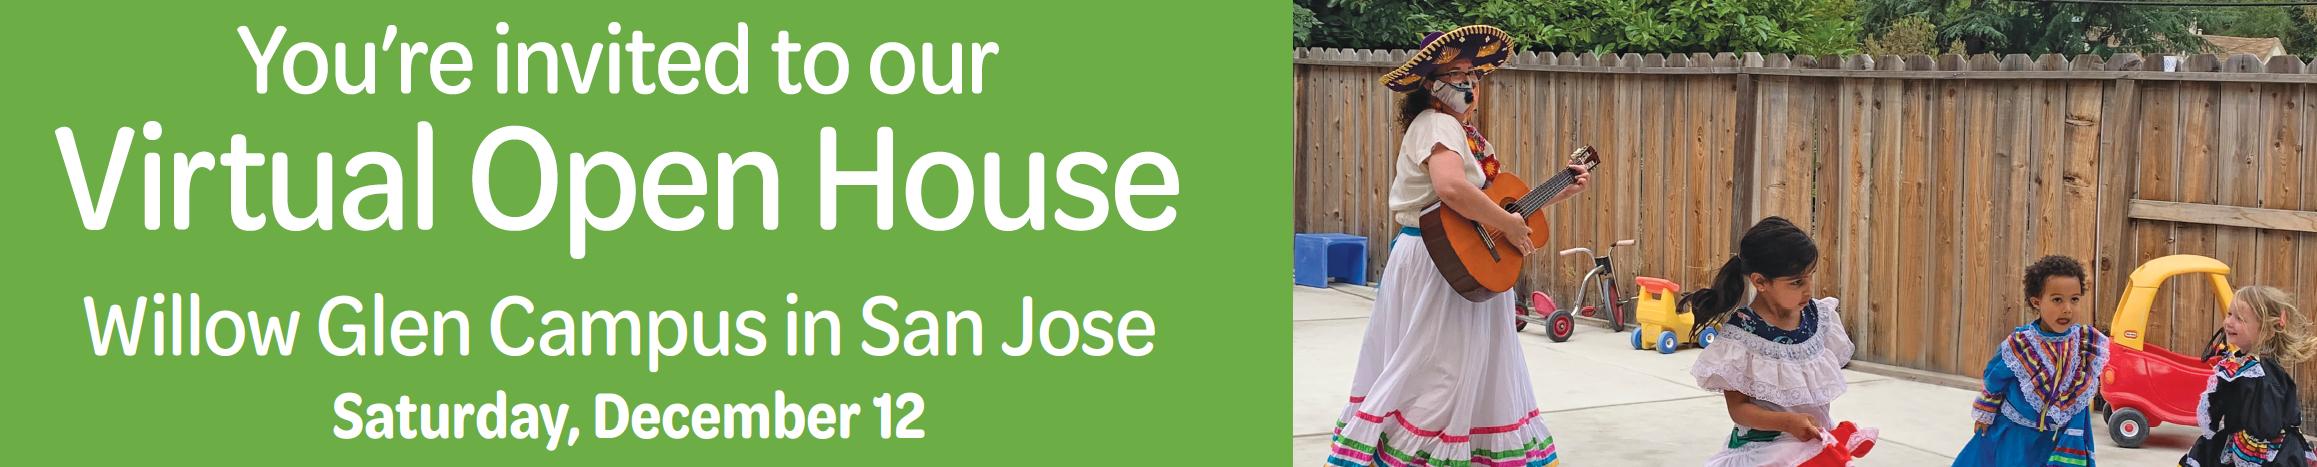 KSS Immersion Preschool of Willow Glen San Jose Open House on December 12th